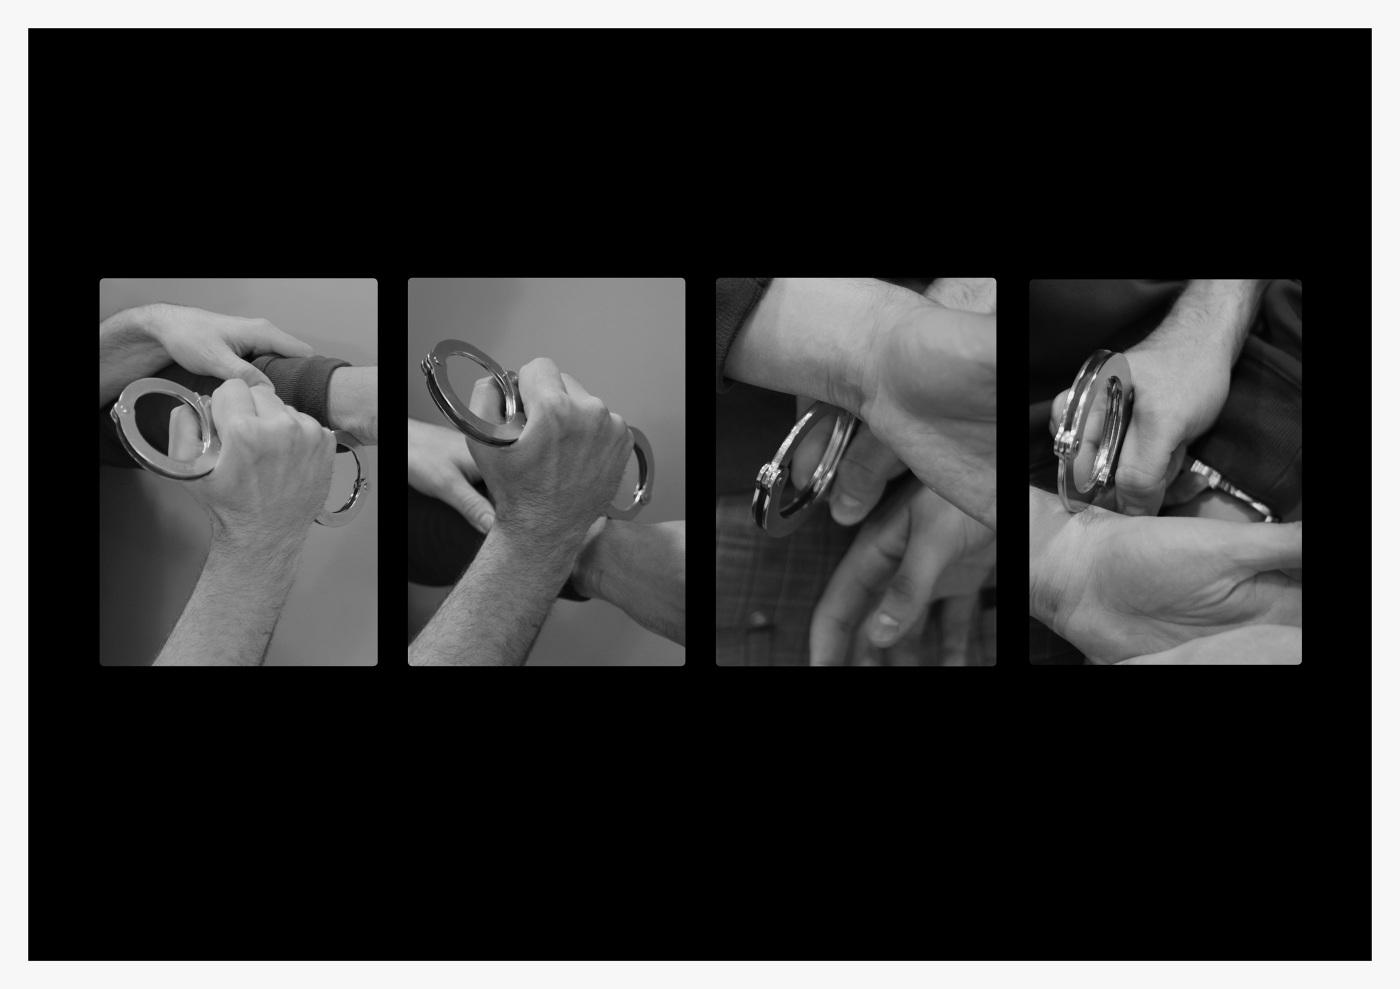 Updating Handcuffs - Industrial Design Portfolio Of Jade -4006